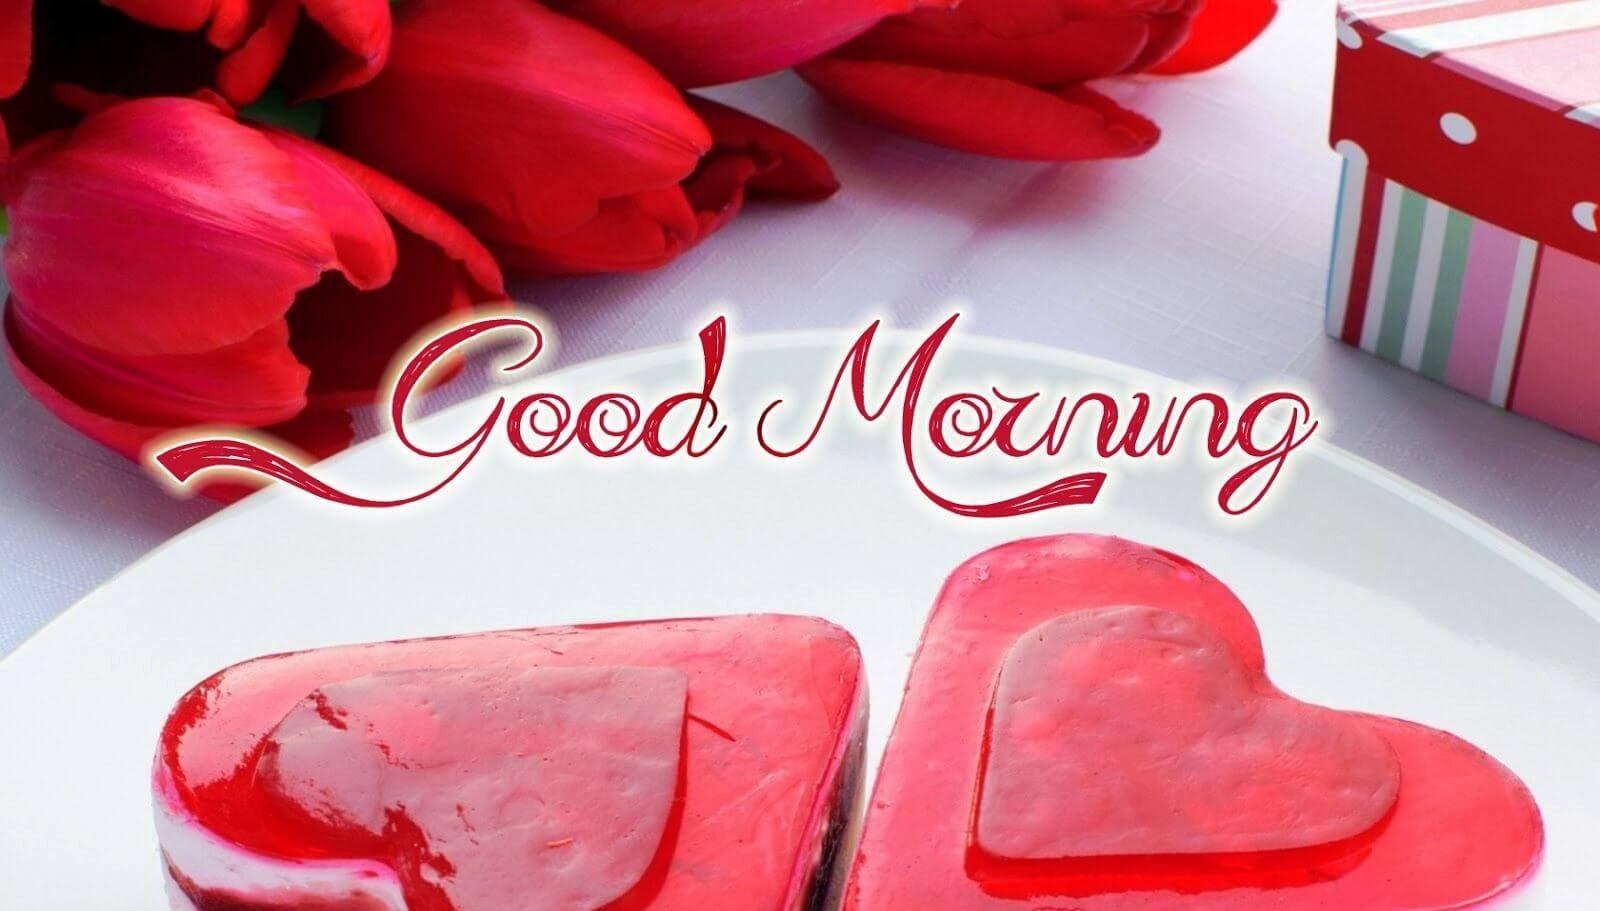 Good Morning Love Wallpaper Wallpapers Good Morning Wallpaper